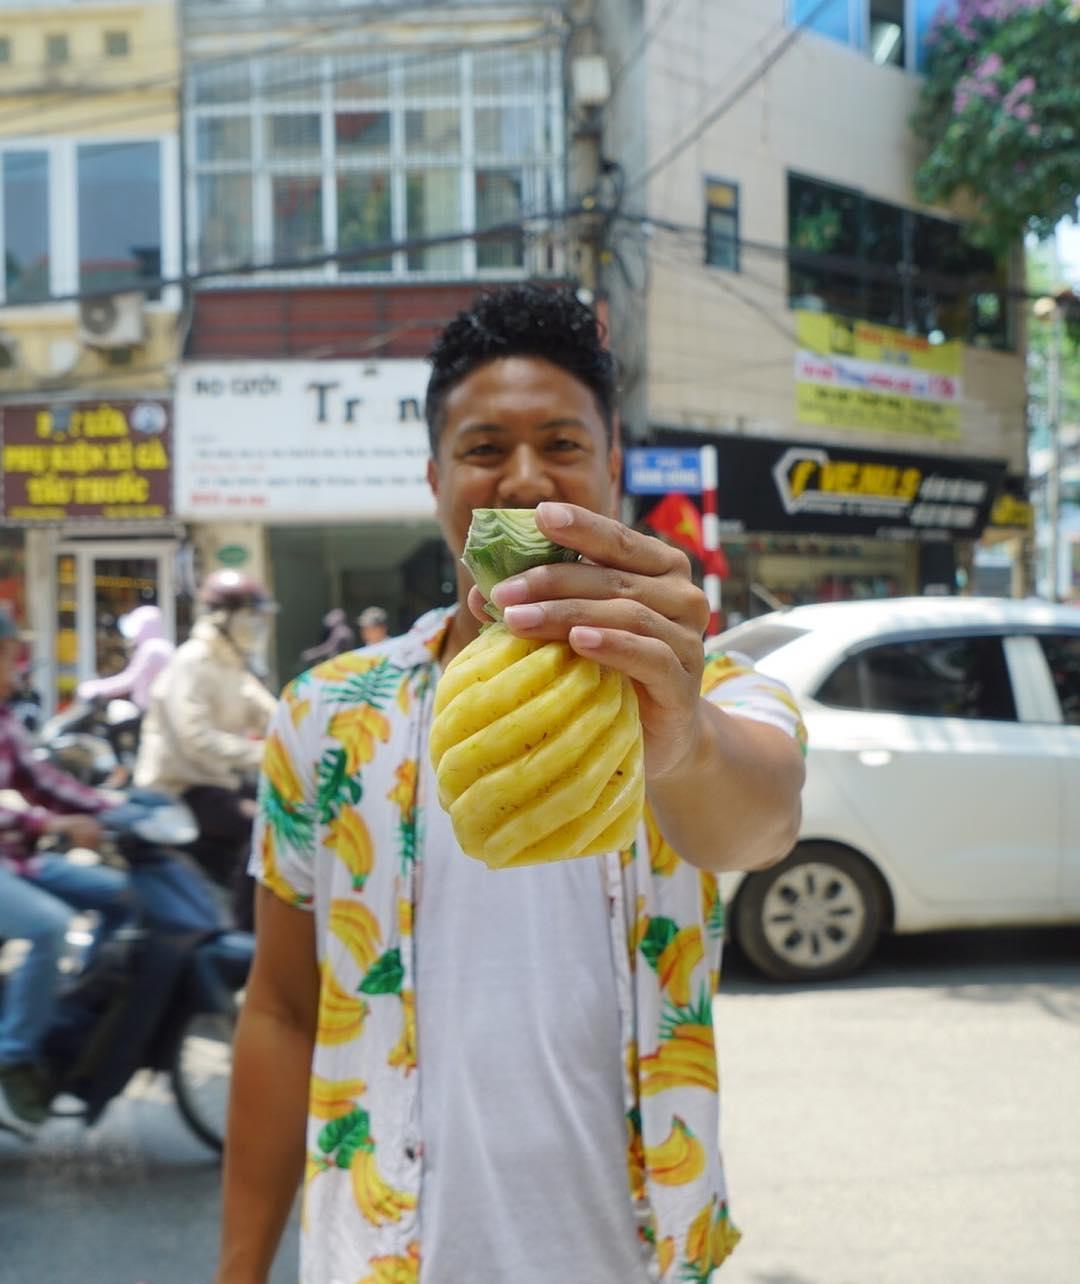 Remote Year Panta Rhei in Hanoi Vietnam | Remote Year